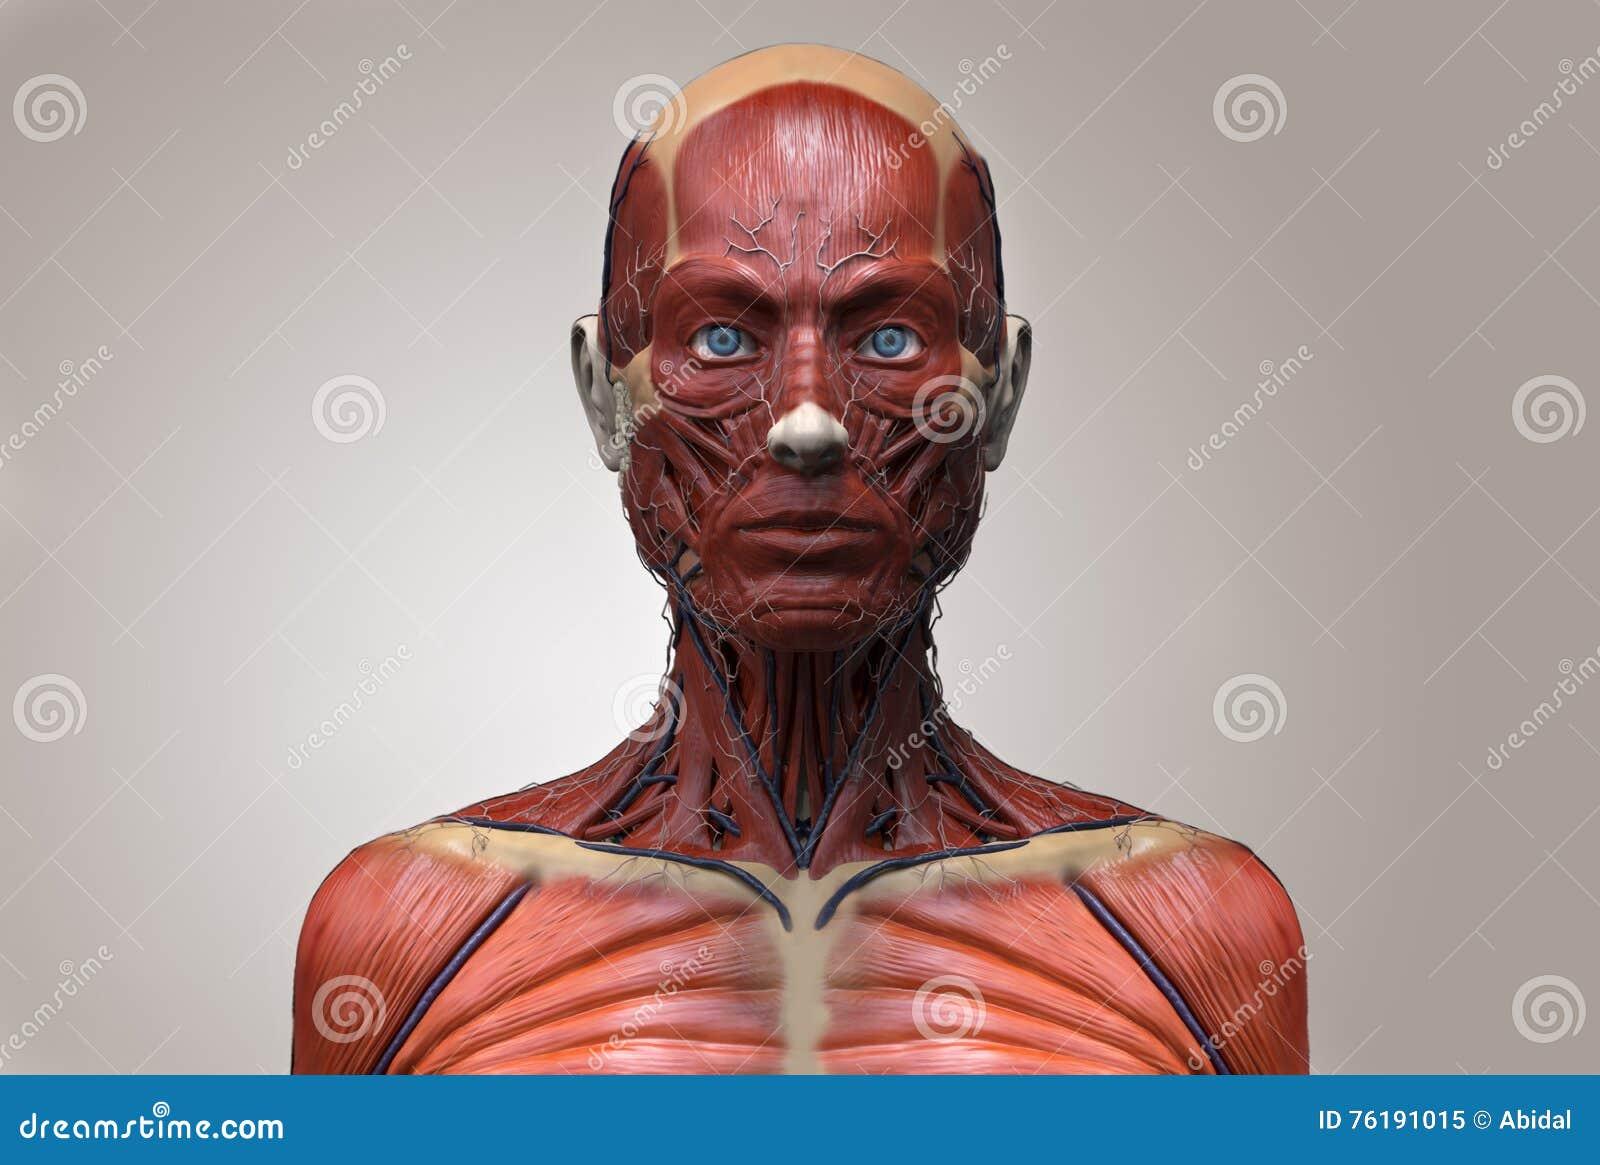 human body anatomy of a female